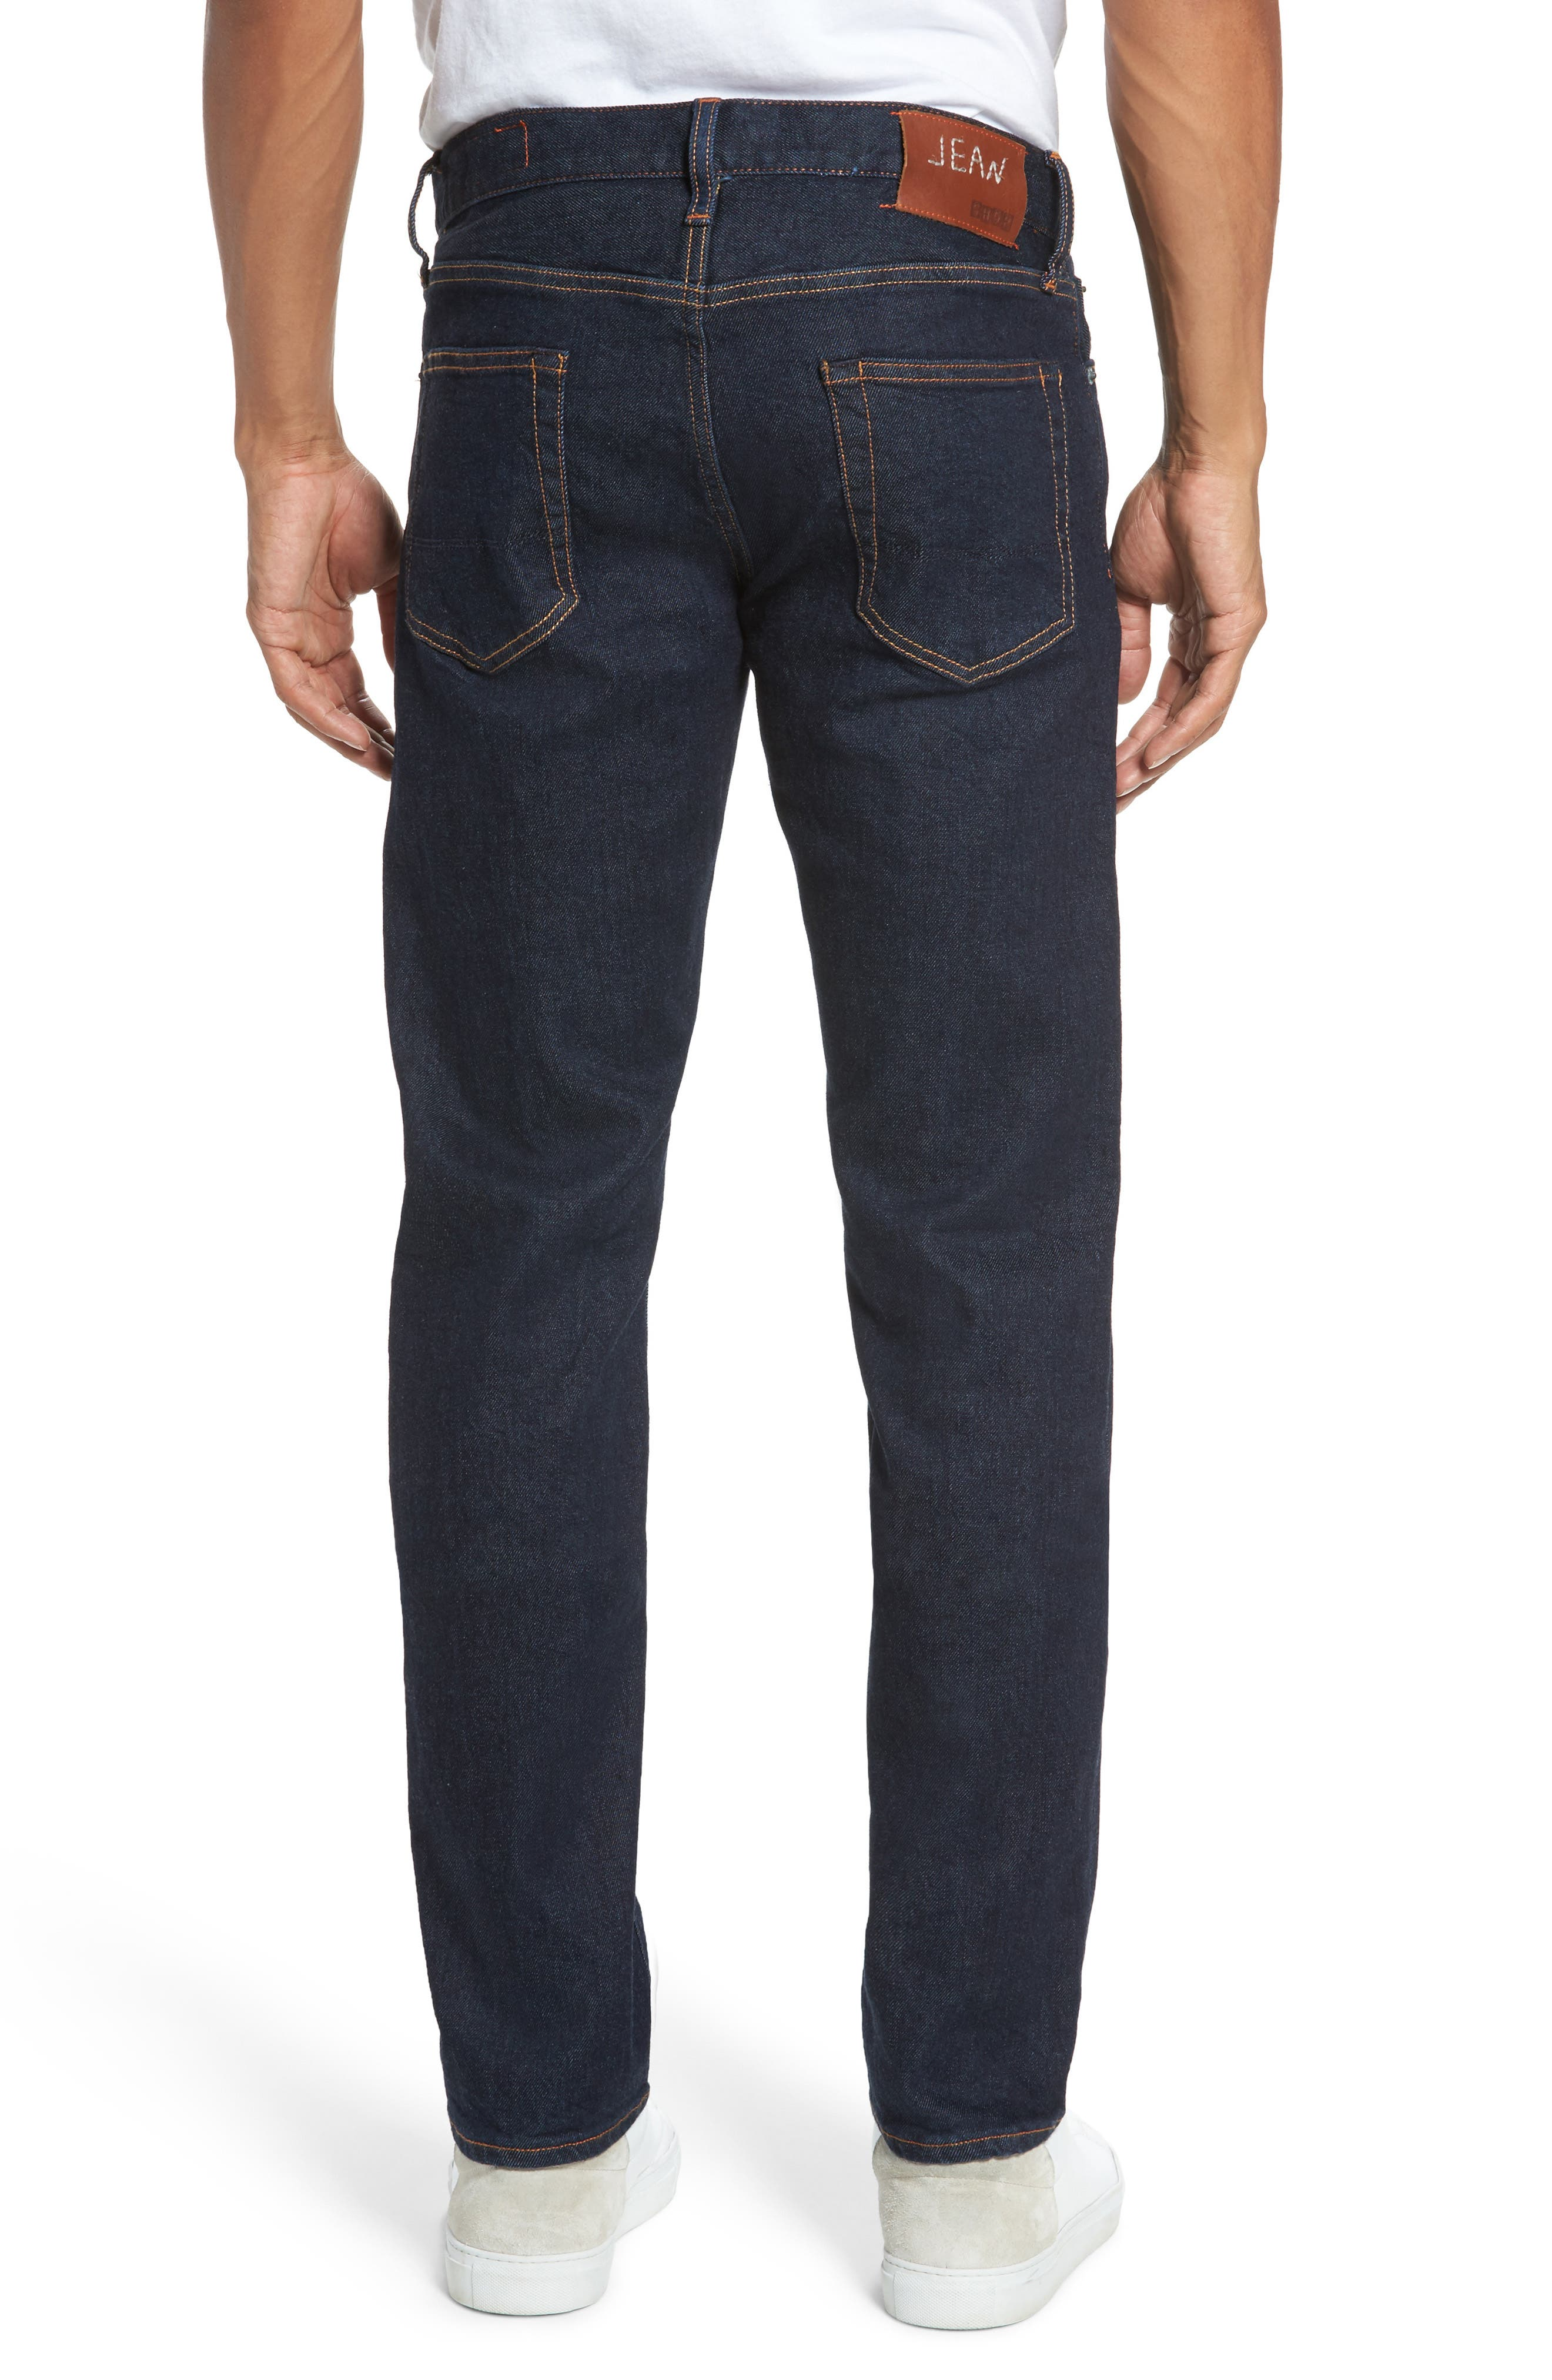 Jim Slim Fit Selvedge Jeans,                             Alternate thumbnail 2, color,                             Stretch Rinse